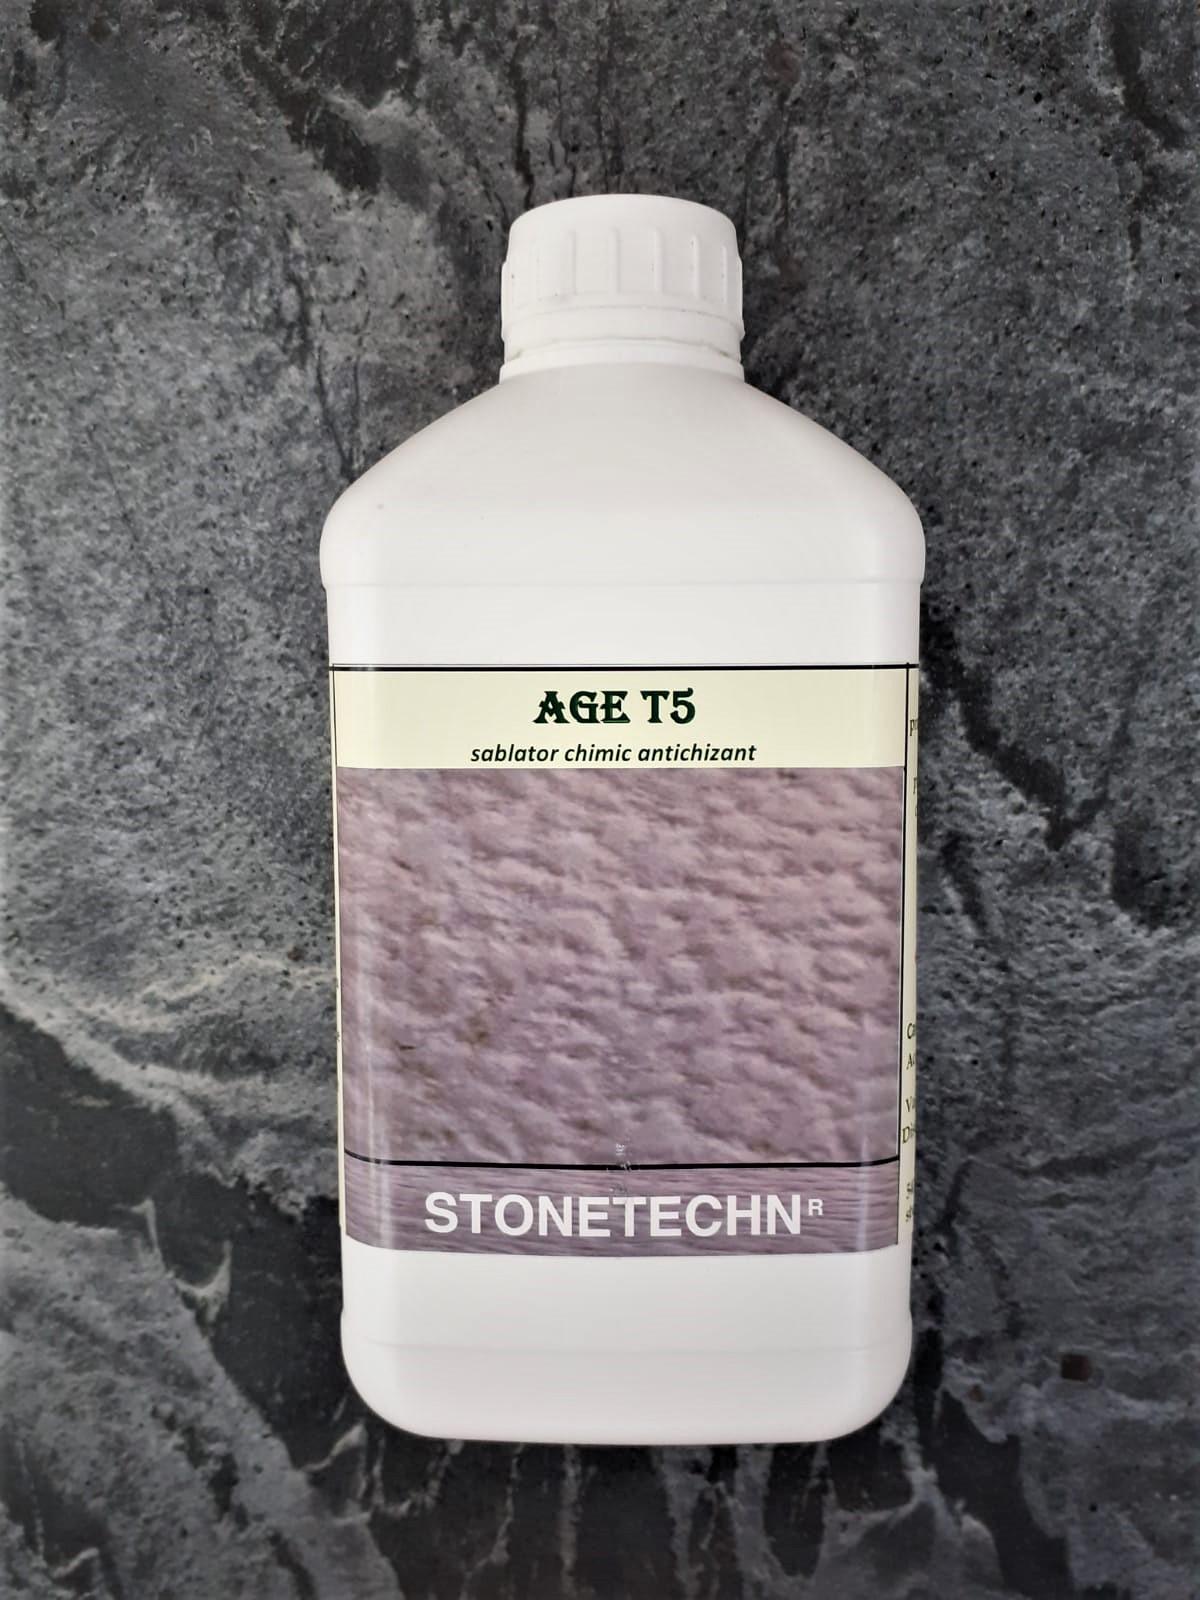 sablator-chimic-antichizant-age-t5-1